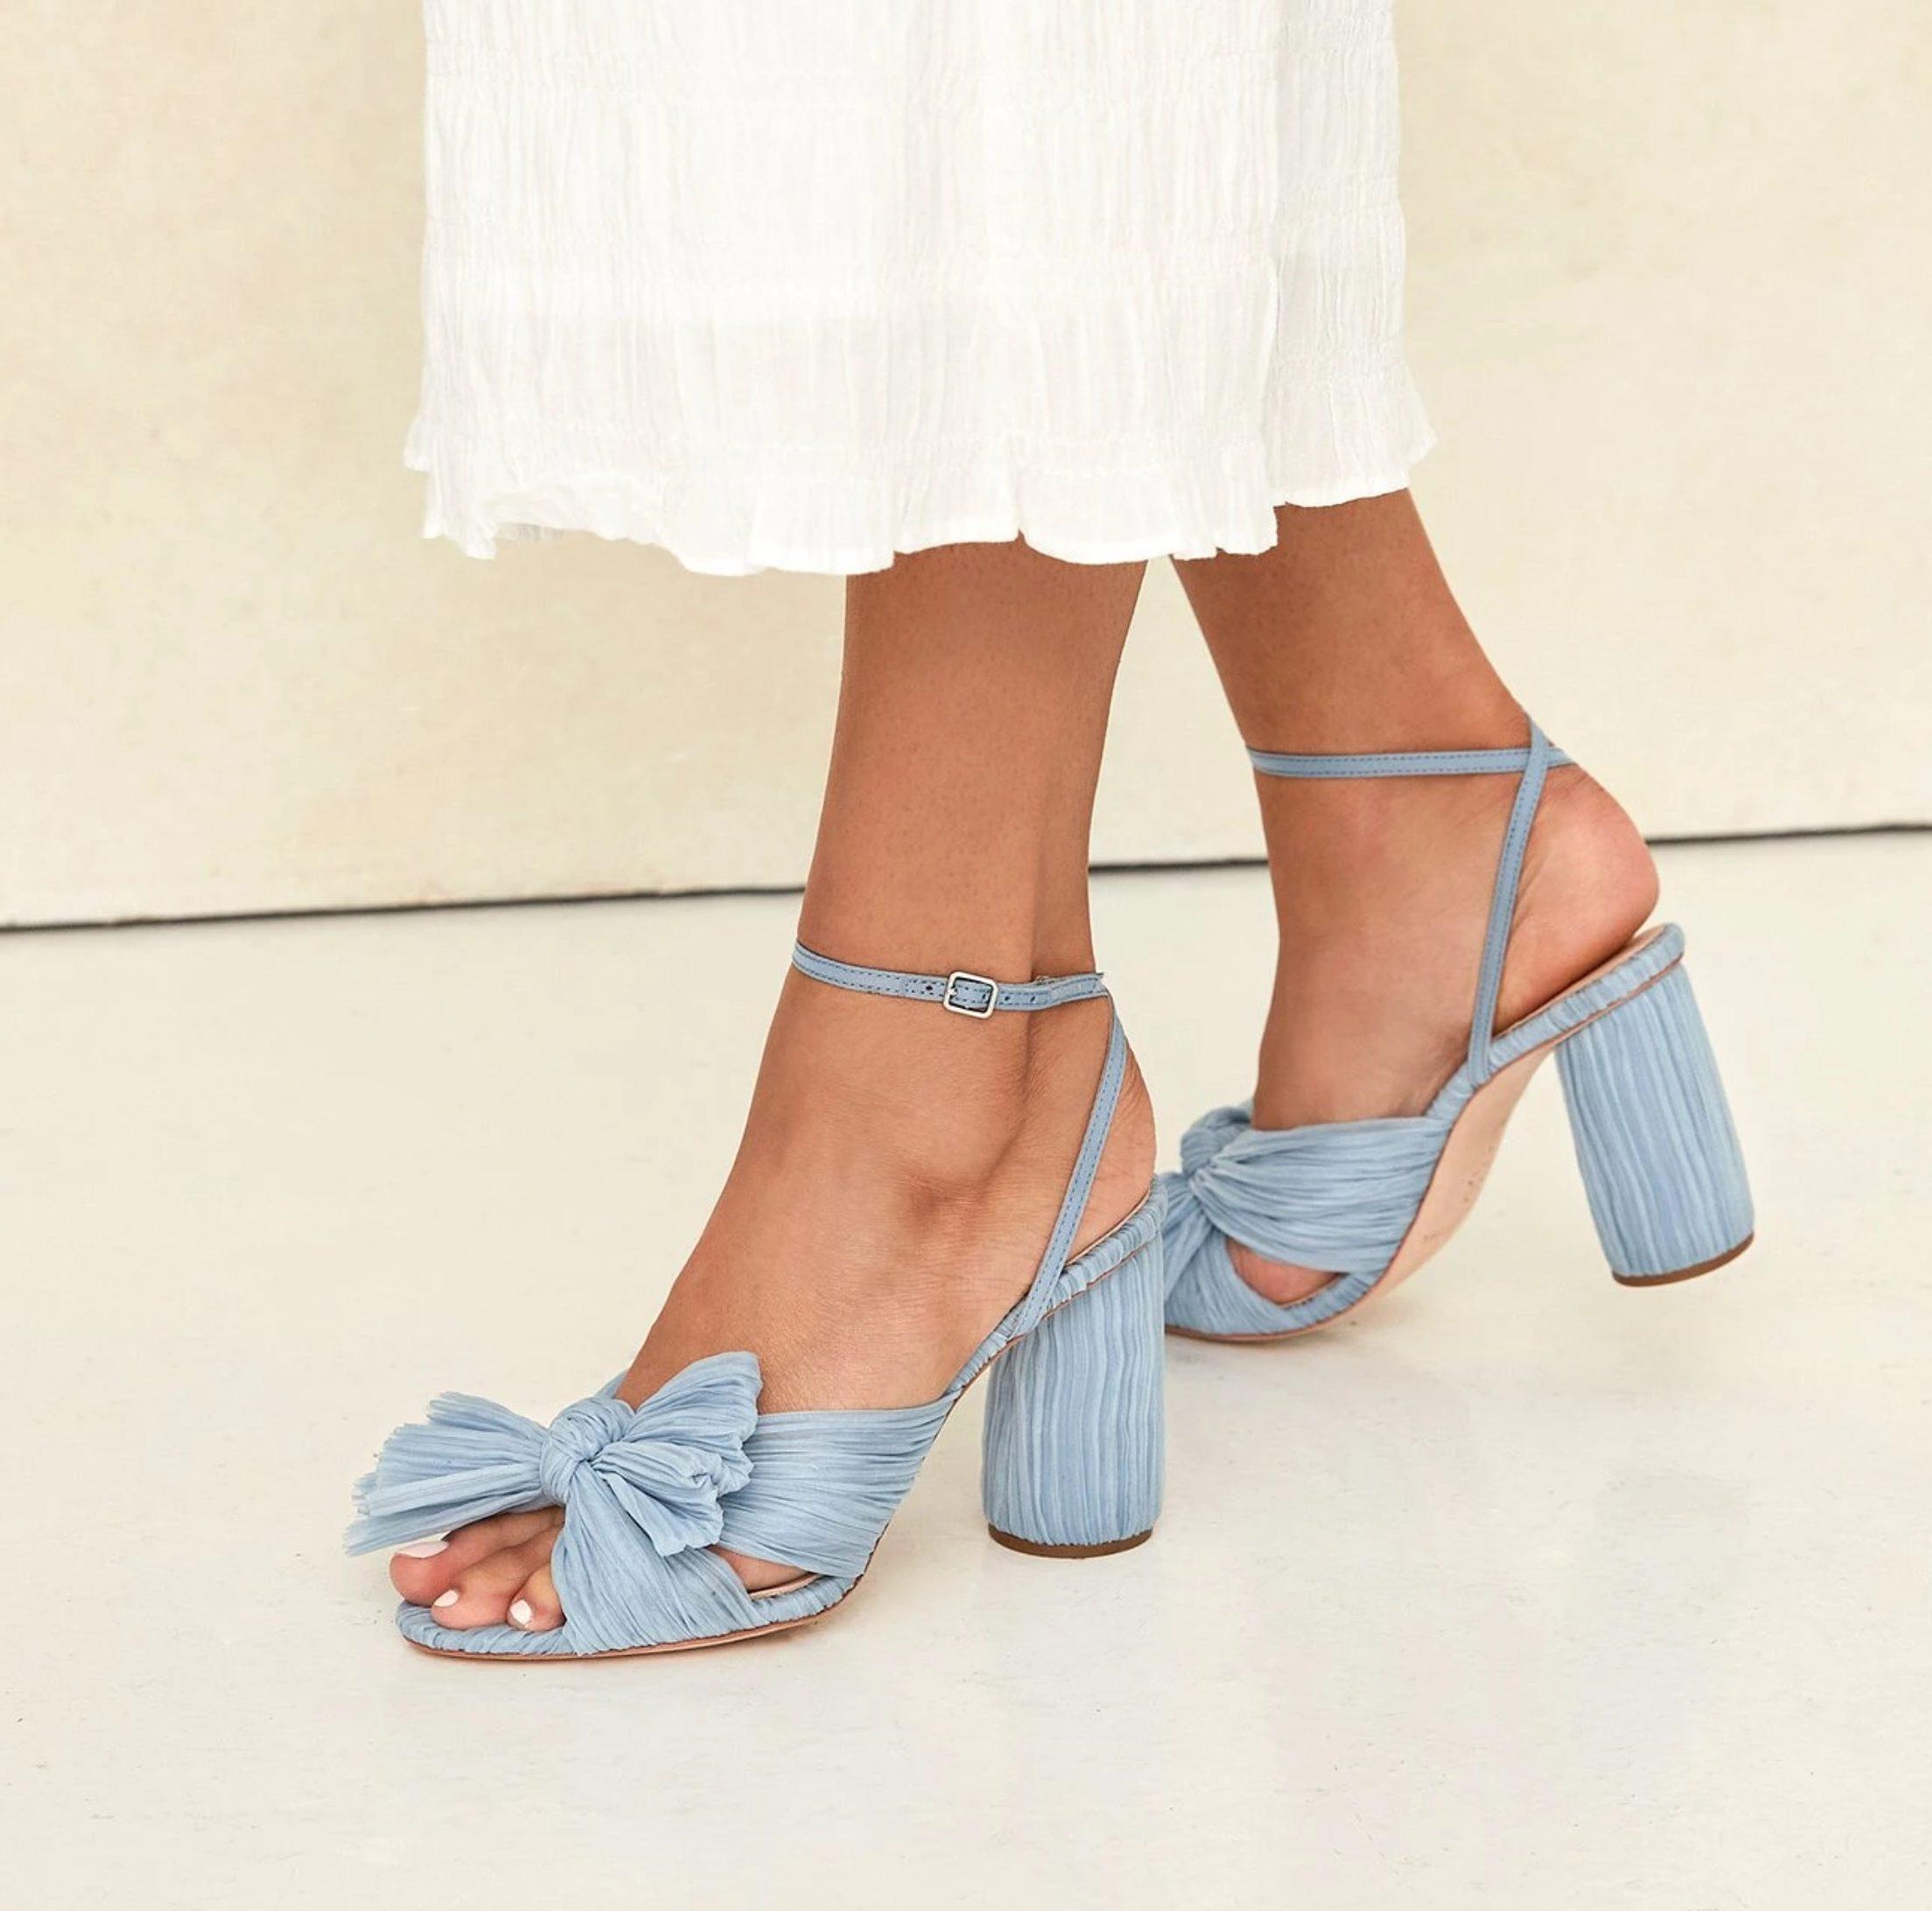 Zapatos de novia de Sophie Turner - Loeffler Randall - Wedding Hub - 06